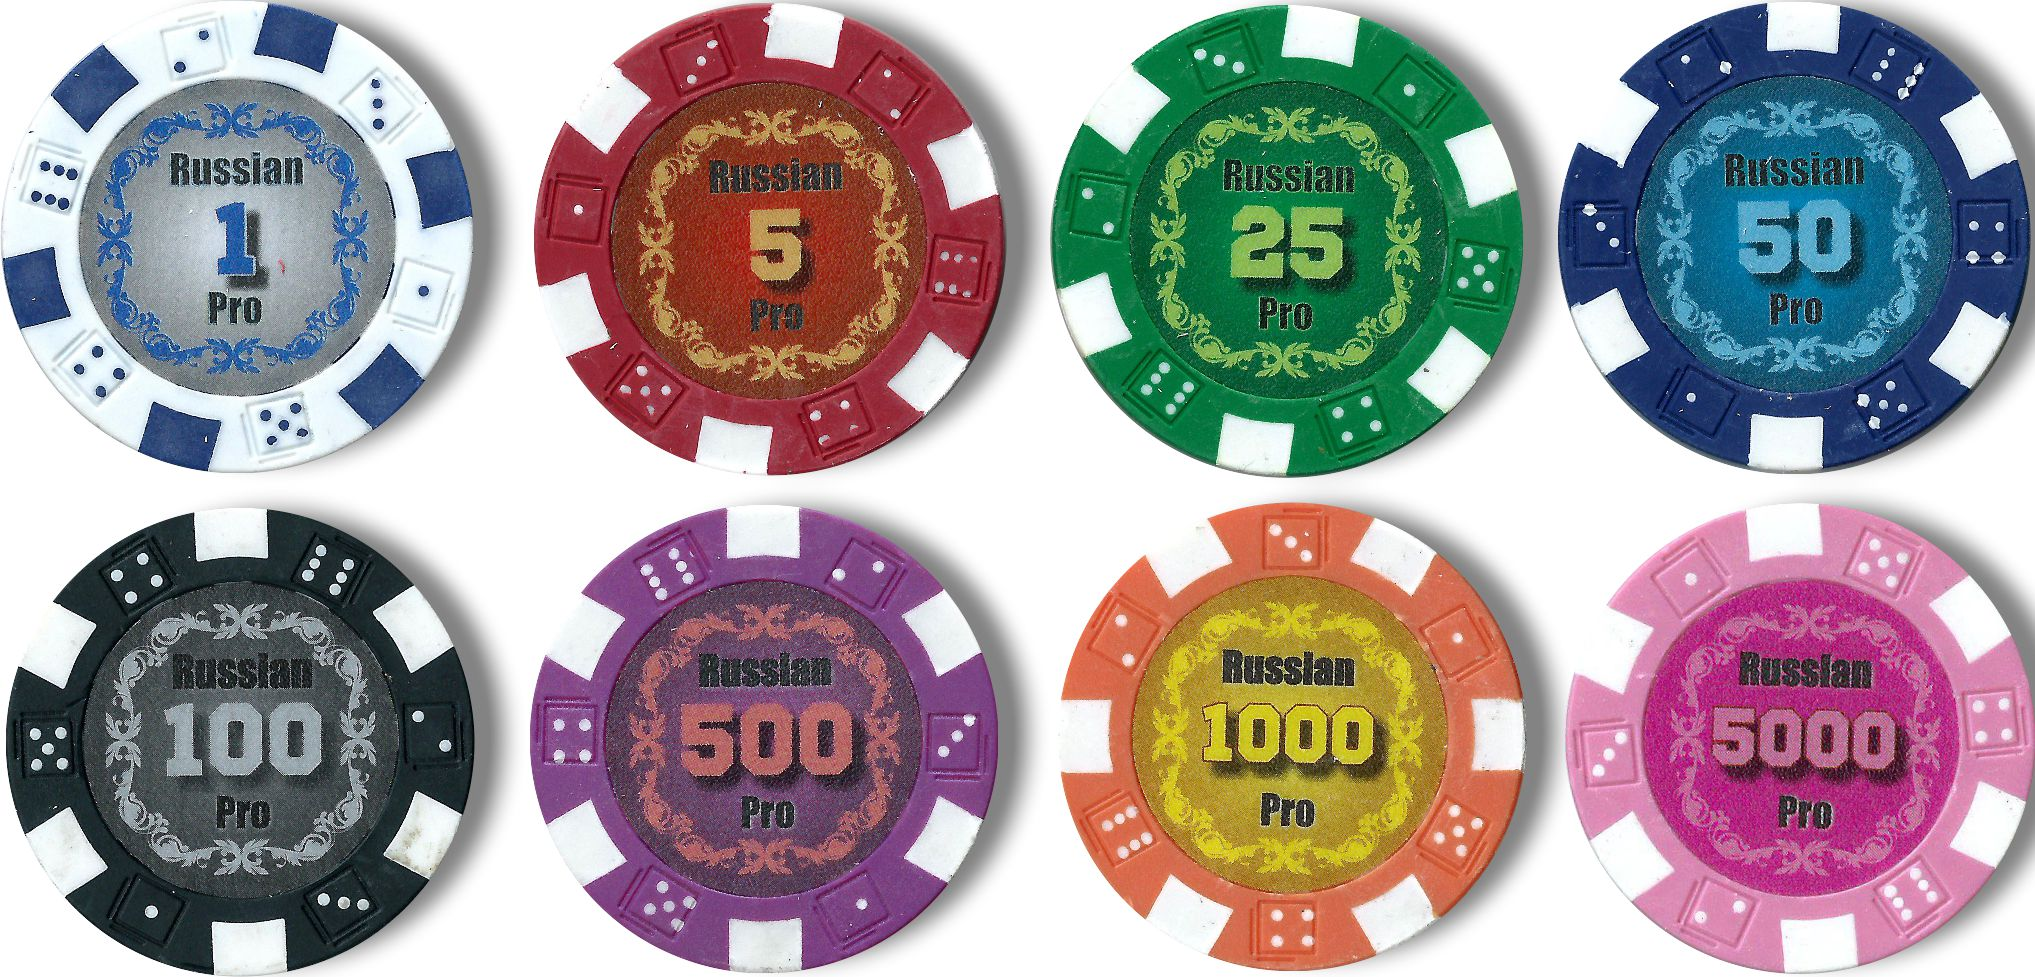 Покерные фишки Russian Pro 11.5 гр